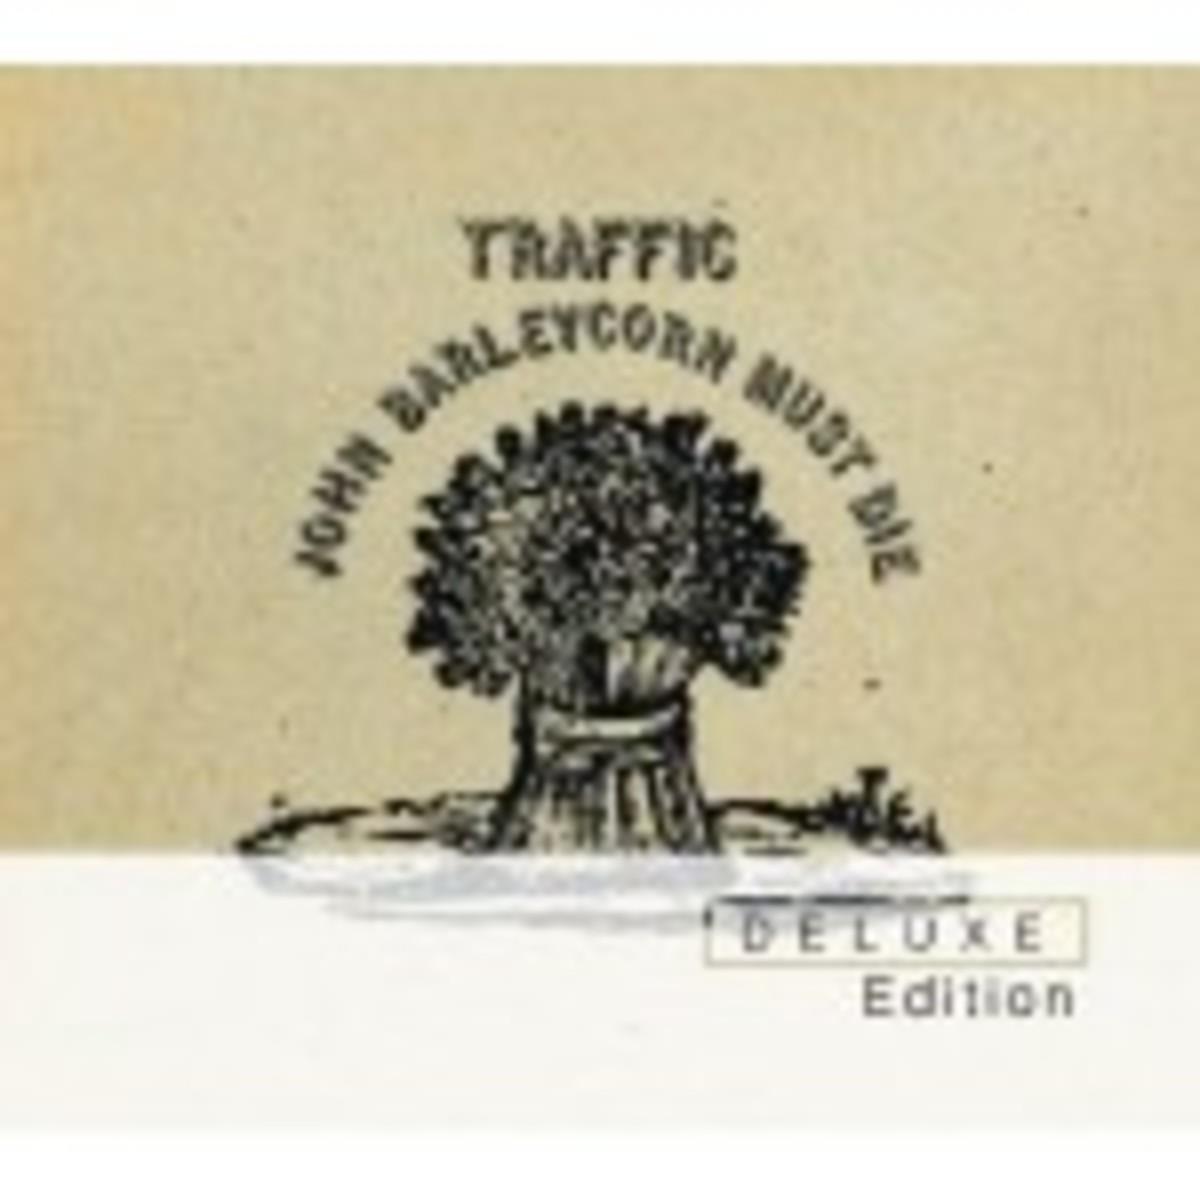 Traffic_John Barleycorn deluxe